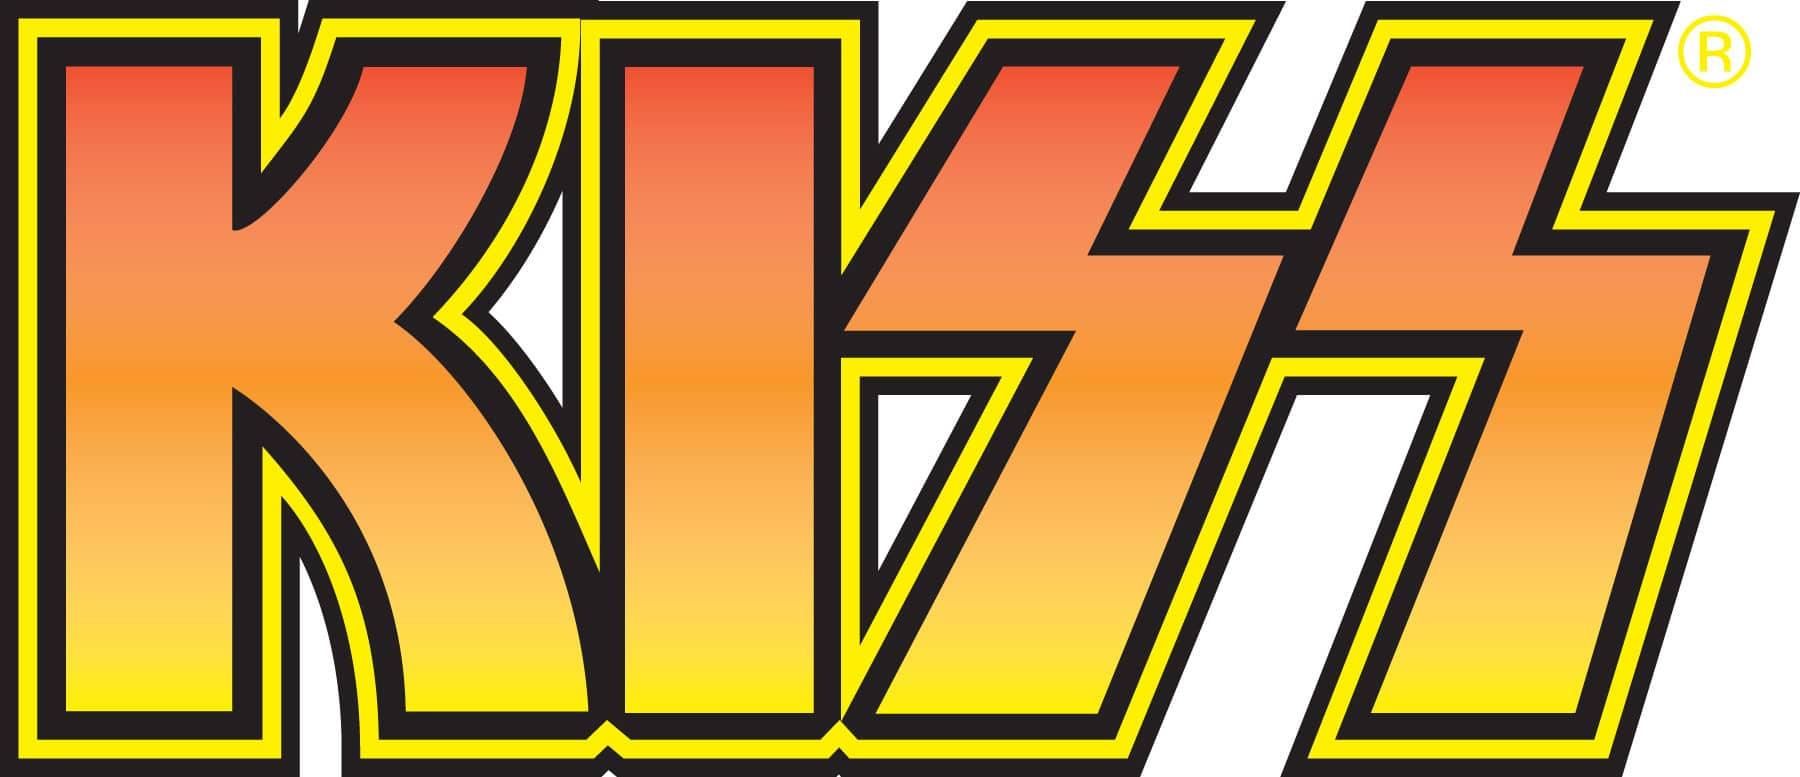 kiss logo jpg sacramento press rh sacramentopress com Kiss Symbol Kiss Symbol